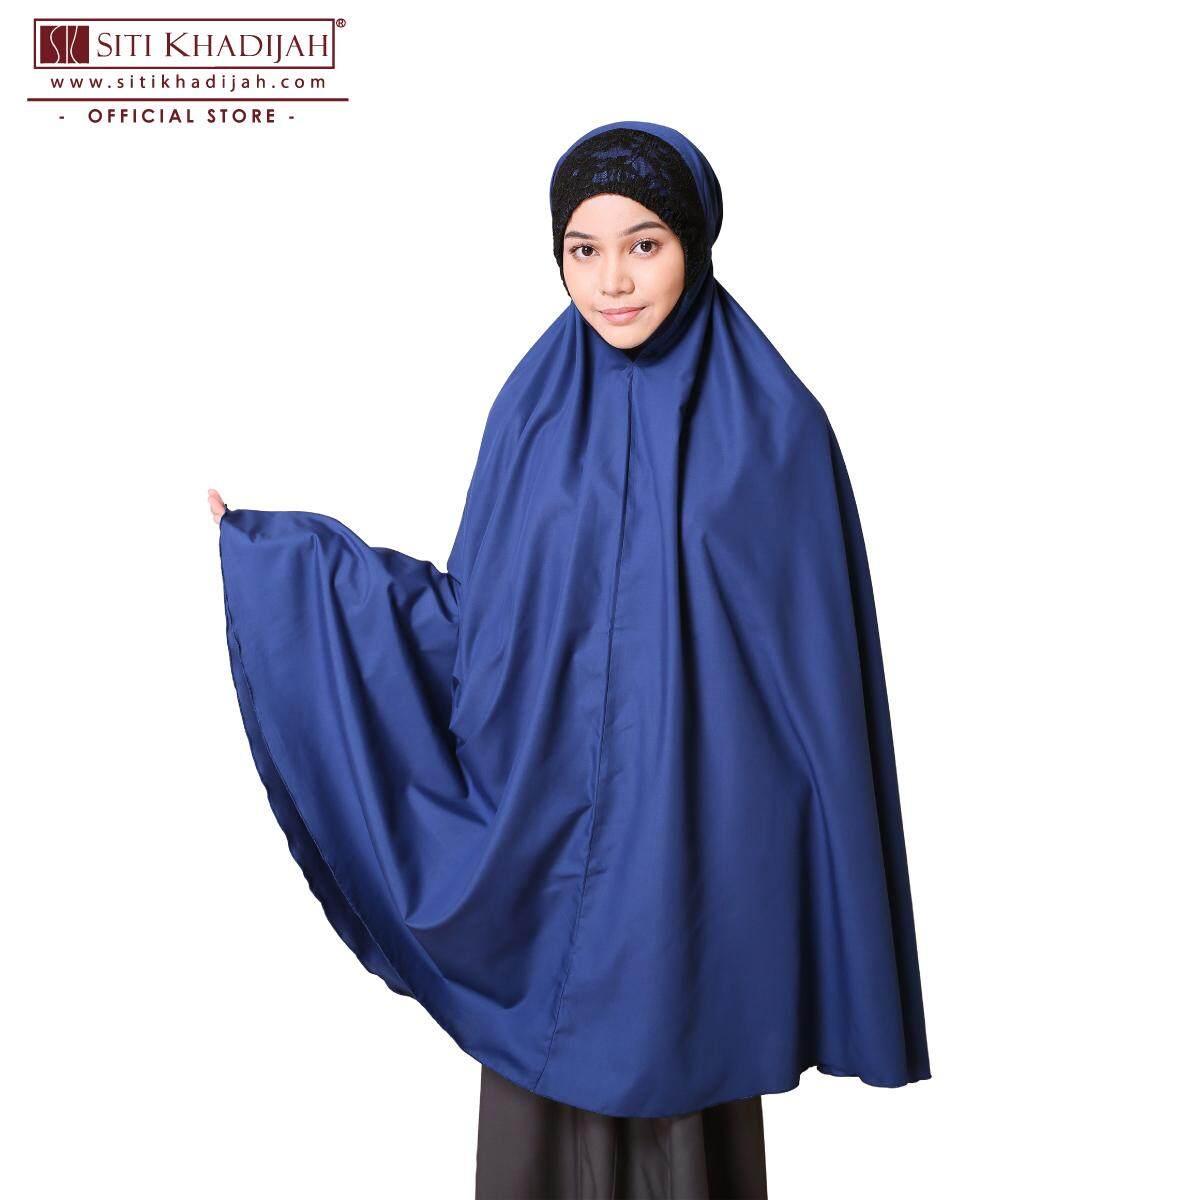 Telekung Siti Khadijah Klasik Daania (Blue) (Top only)